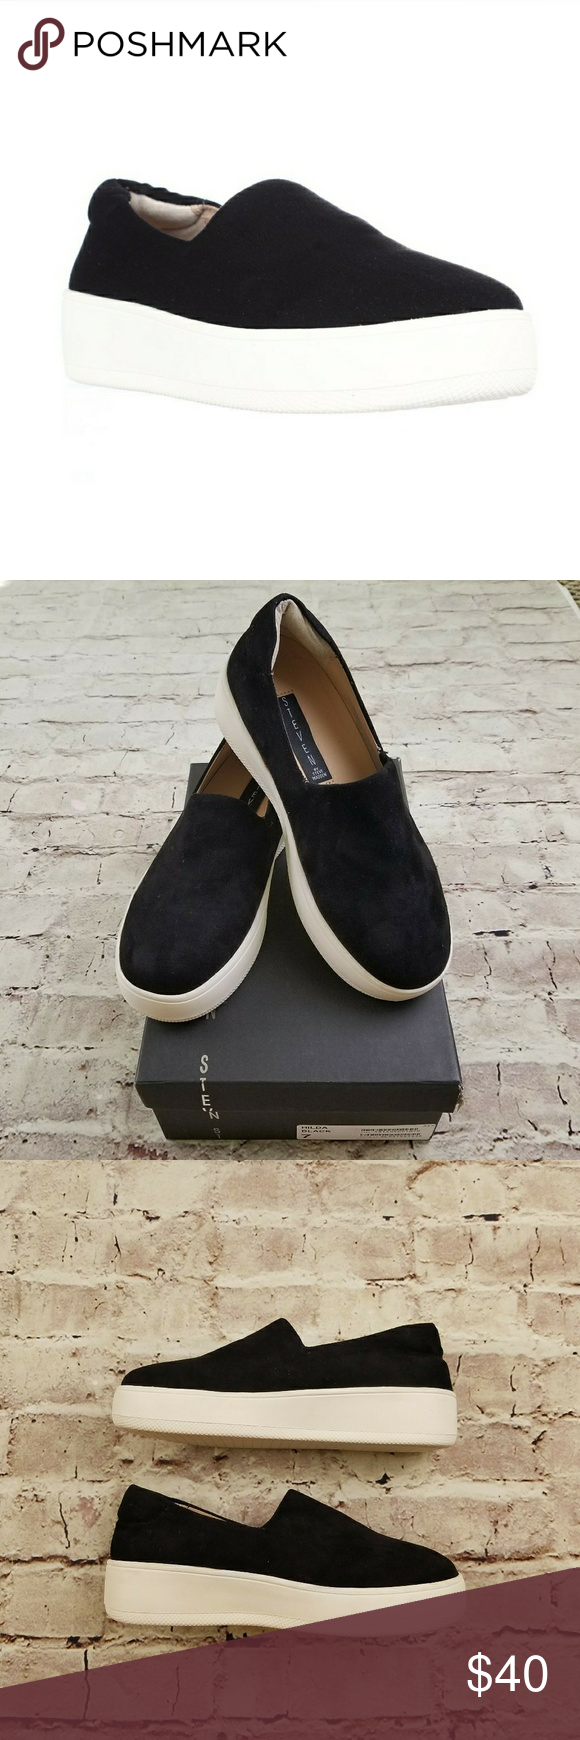 15dc1ea465f STEVEN Steve Madden Hilda Fashion Sneakers Slip-On STEVEN by Steve Madden  Women s Hilda Fashion